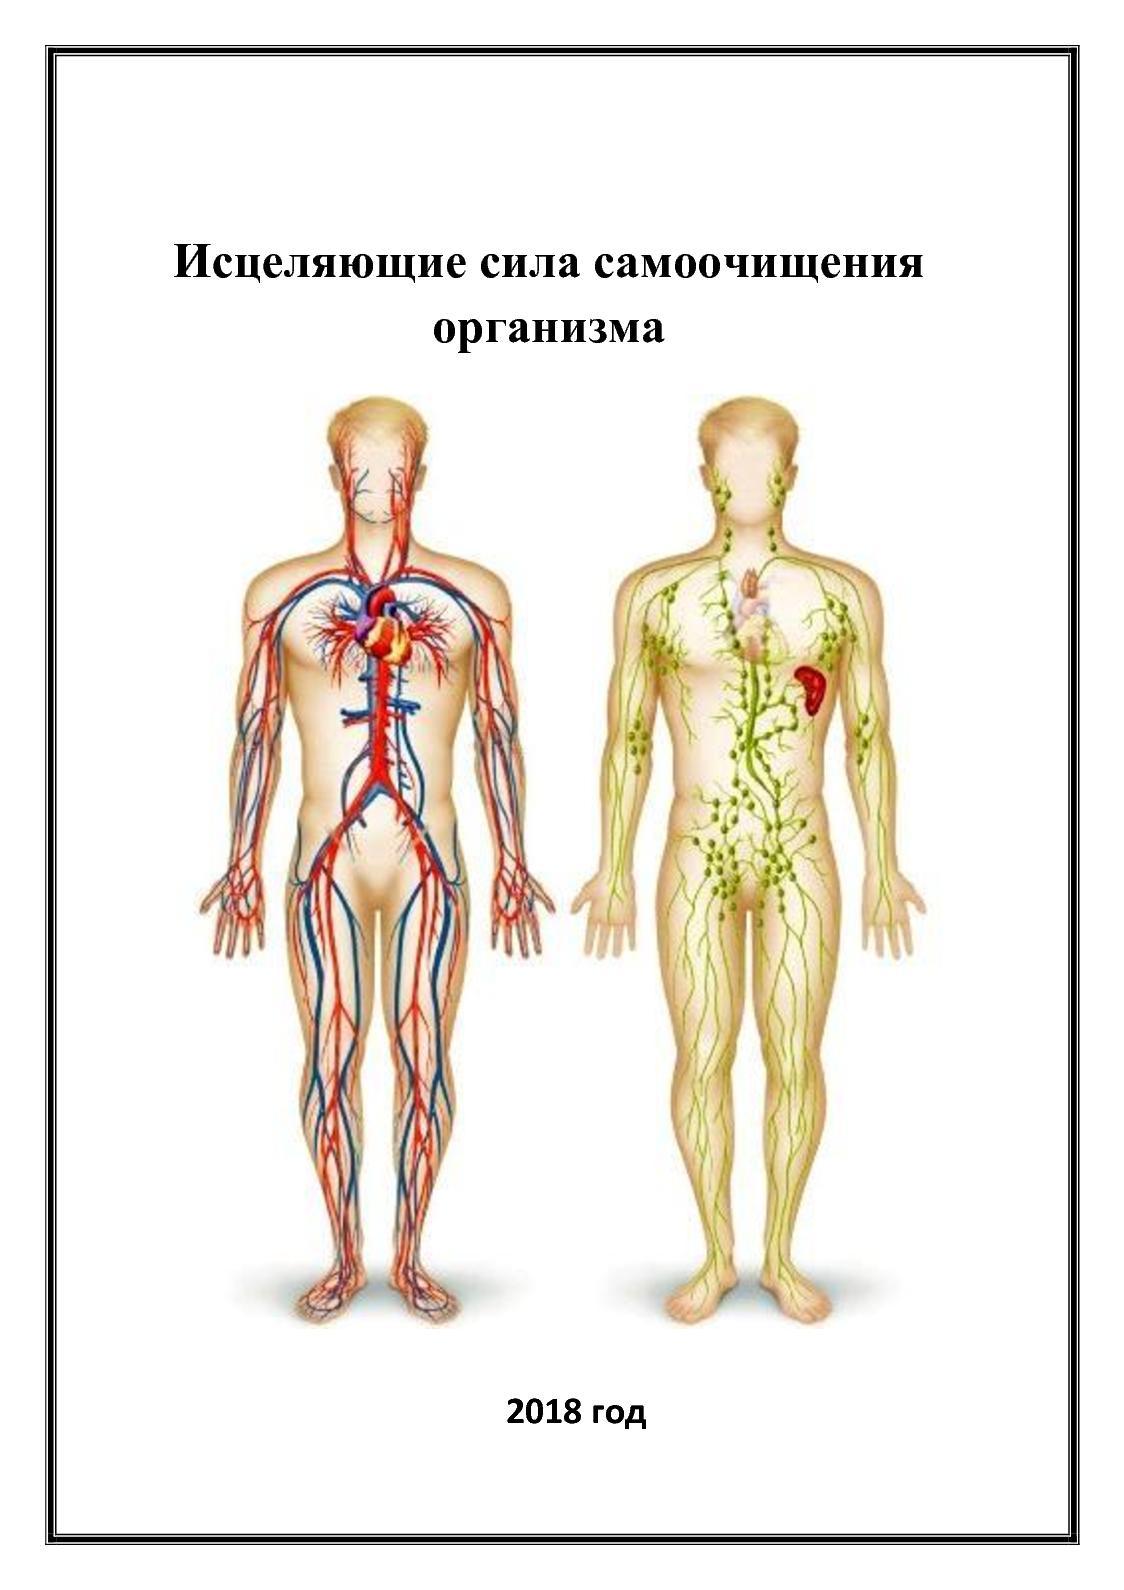 Эти техники активируют лимфатический обмен по всему телу